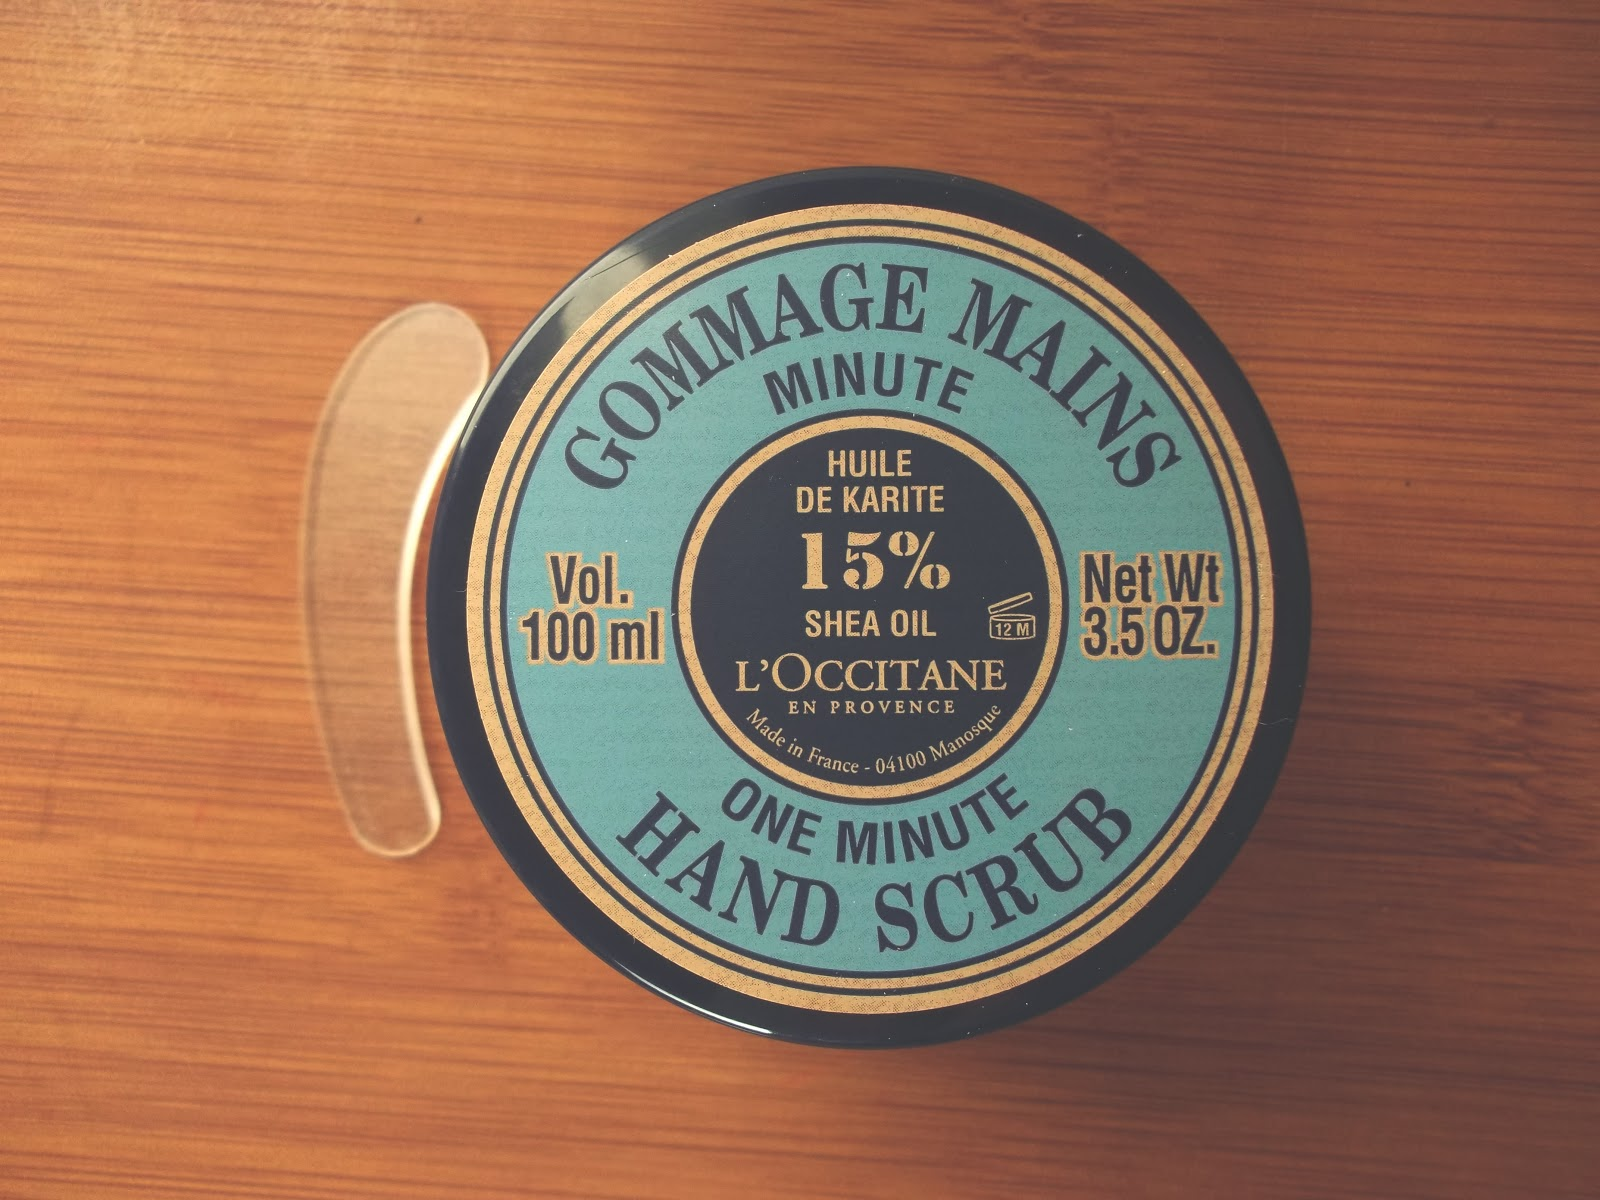 hand scrub